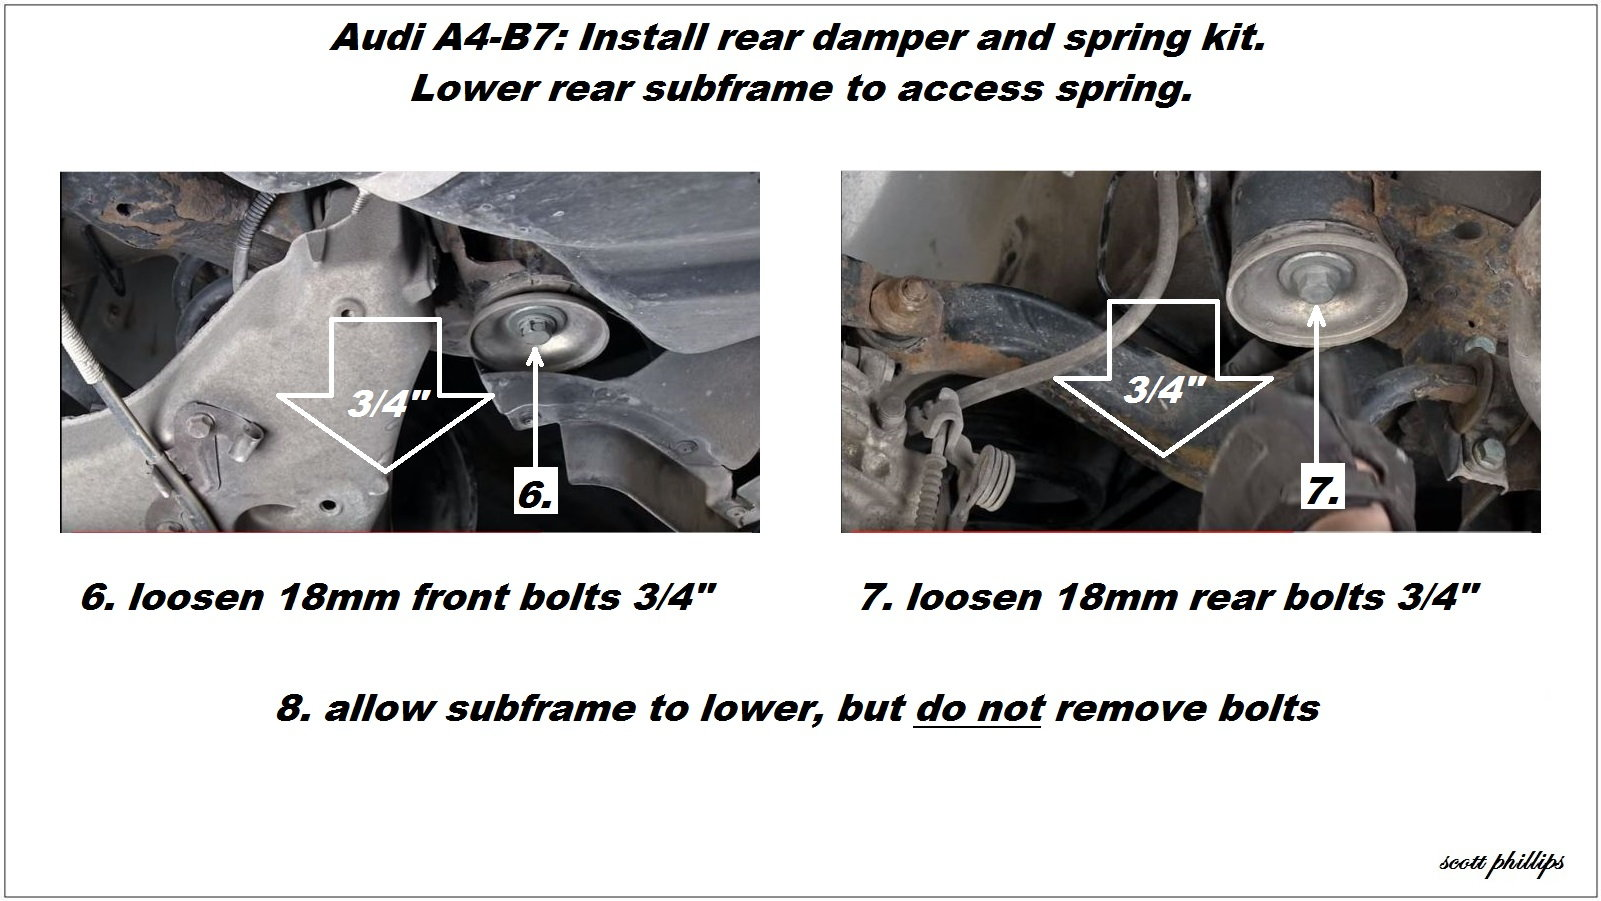 audi a4 b7 shock reviews and how to install shock absorber audiworld rh audiworld com 1999 Audi A4 Interior 1992 Audi A4